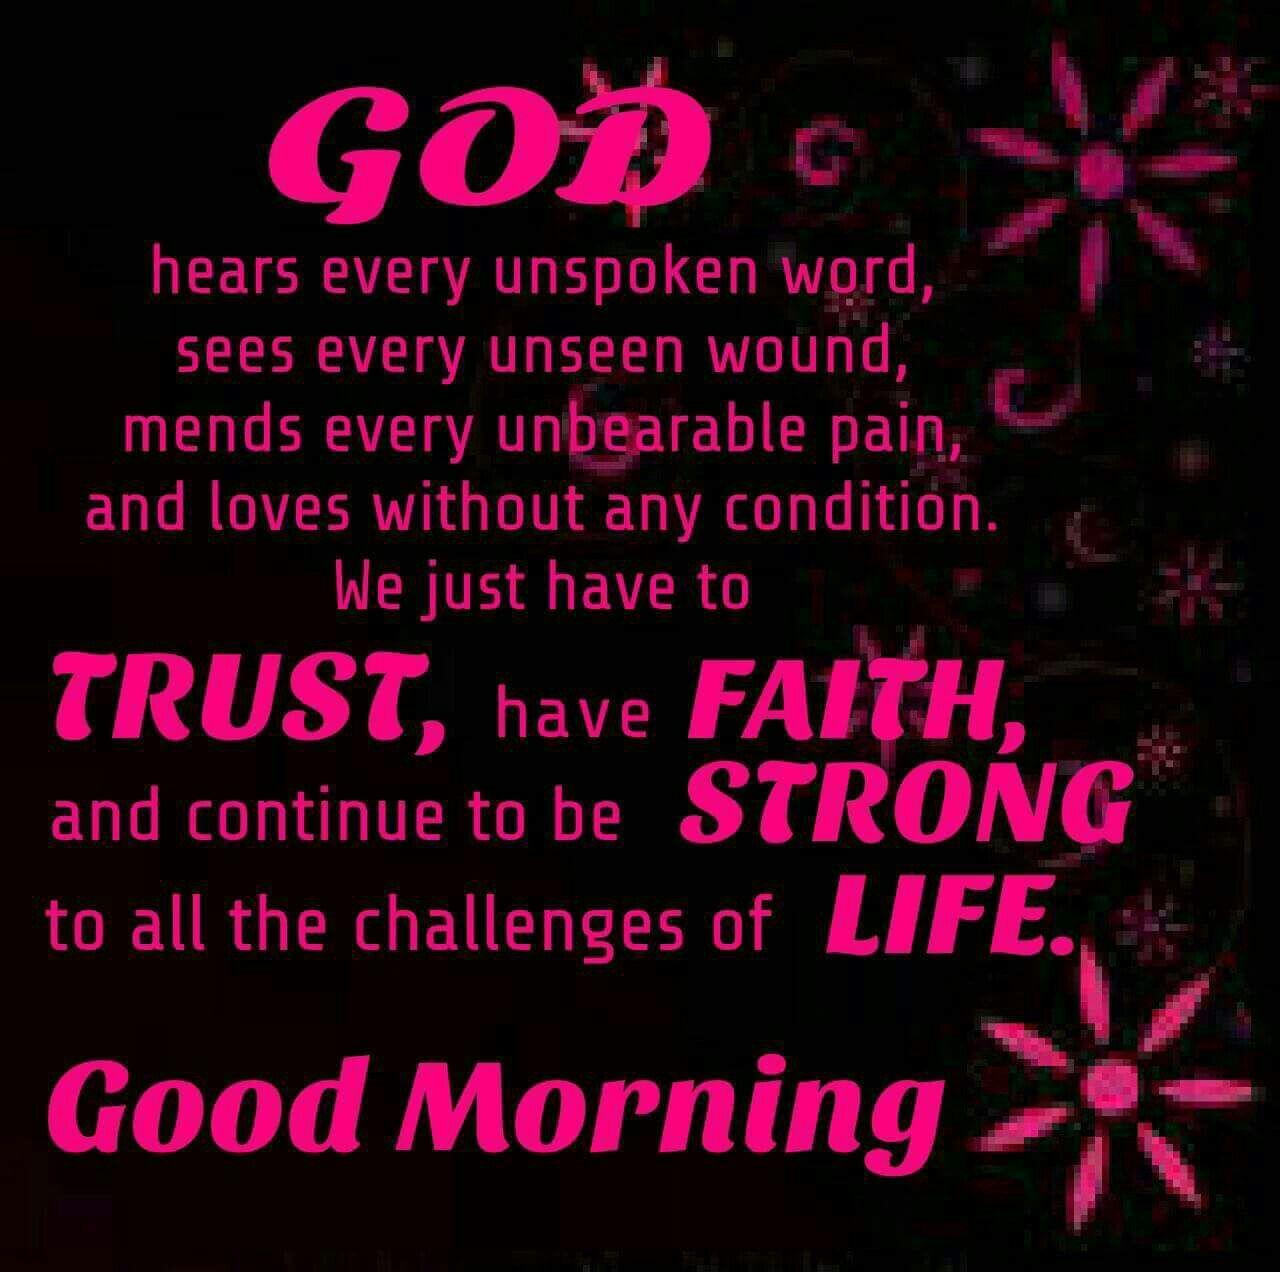 Amen Beautiful Thank You Father God God Bless You My Beautiful Friend Pamela Ly Good Morning Quotes Good Morning Texts Morning Greetings Quotes